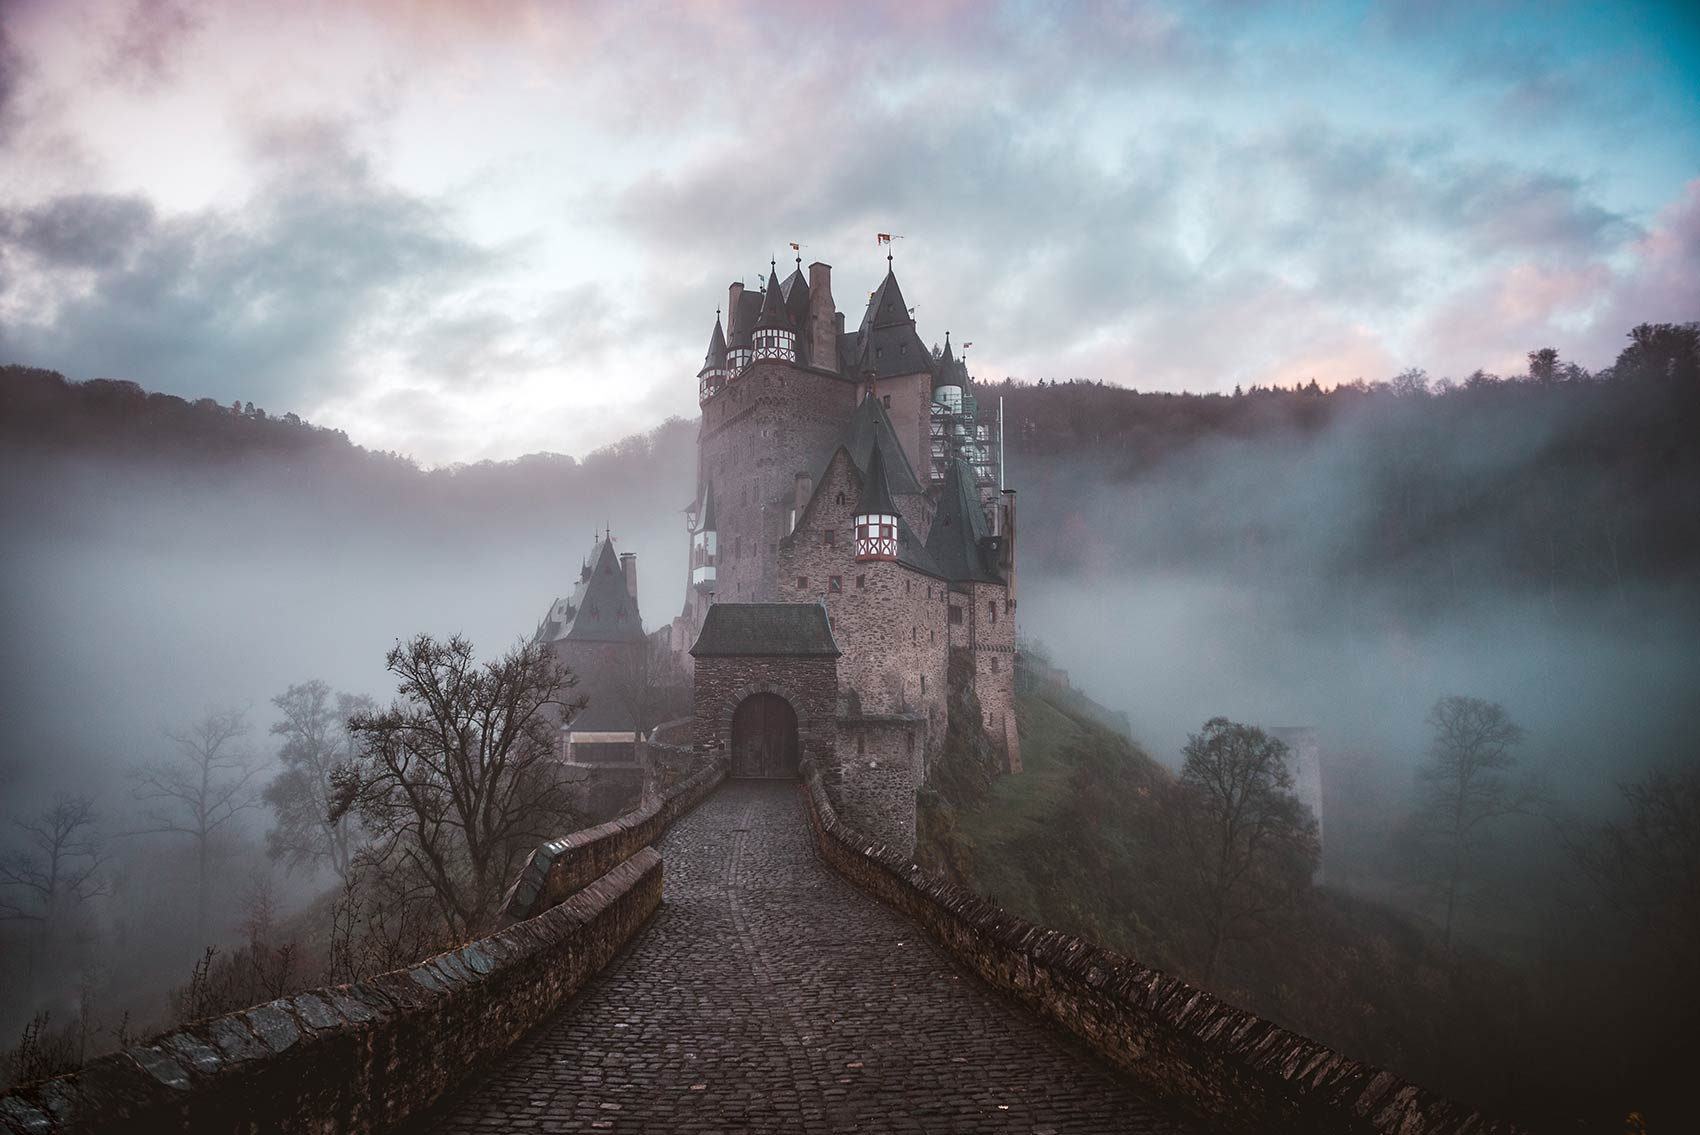 2. European Castles